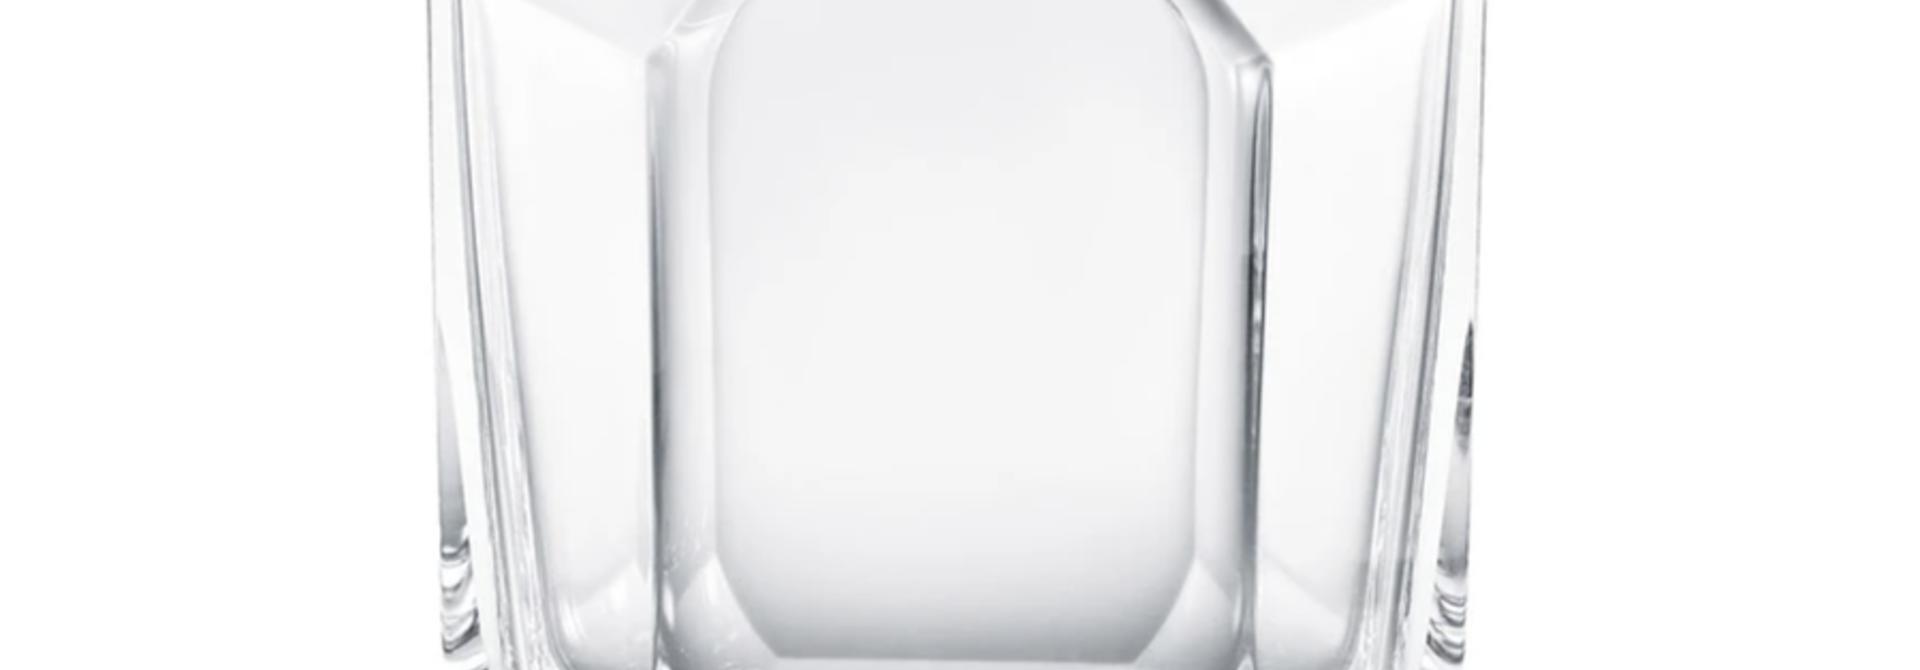 BACCARAT - Vase Octogon 25cm